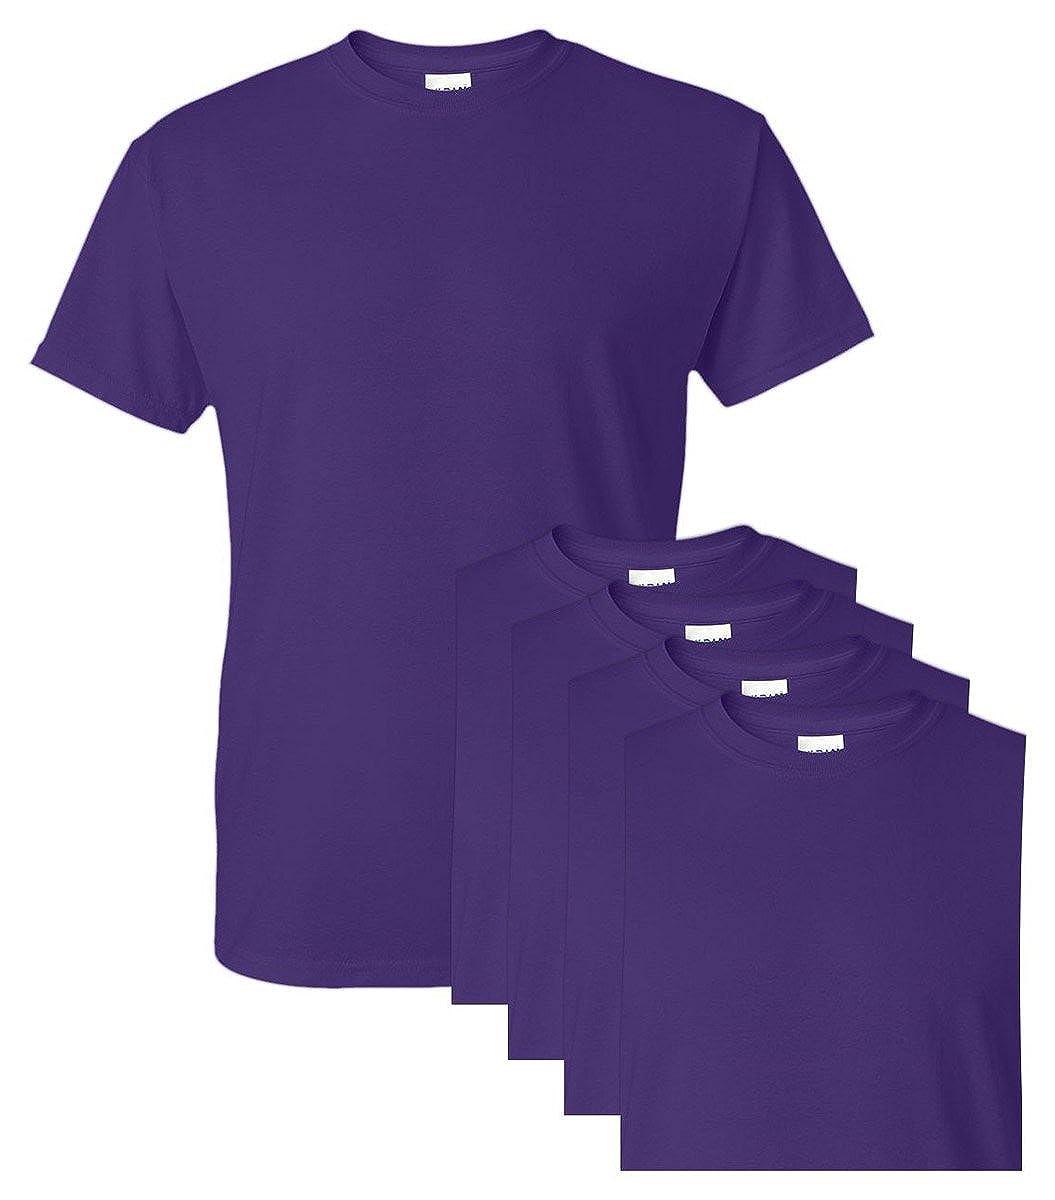 Gildan G8000 50/% Cotton 50/% Polyester DryBlend T-Shirt Purple Small 5 Pack